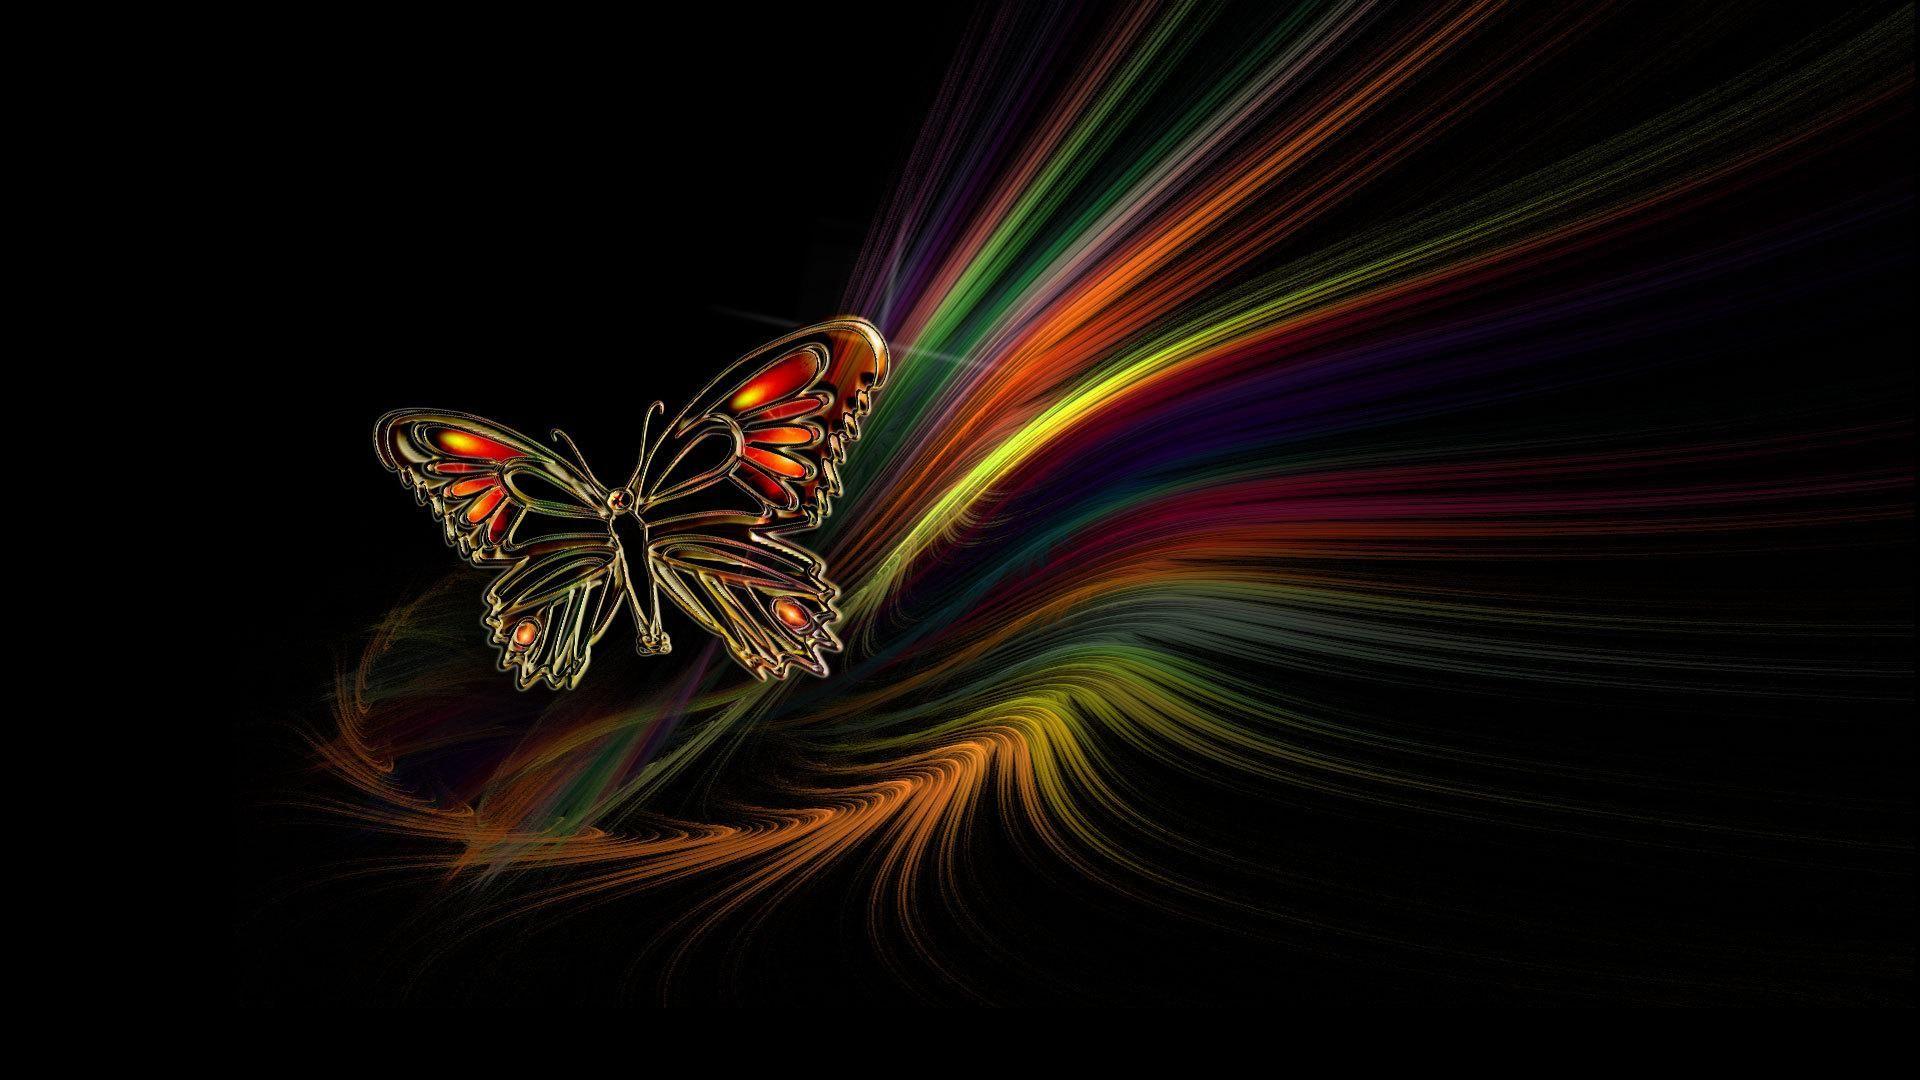 Butterfly Wallpapers Best Wallpapers 1920×1080 Butterfly ...